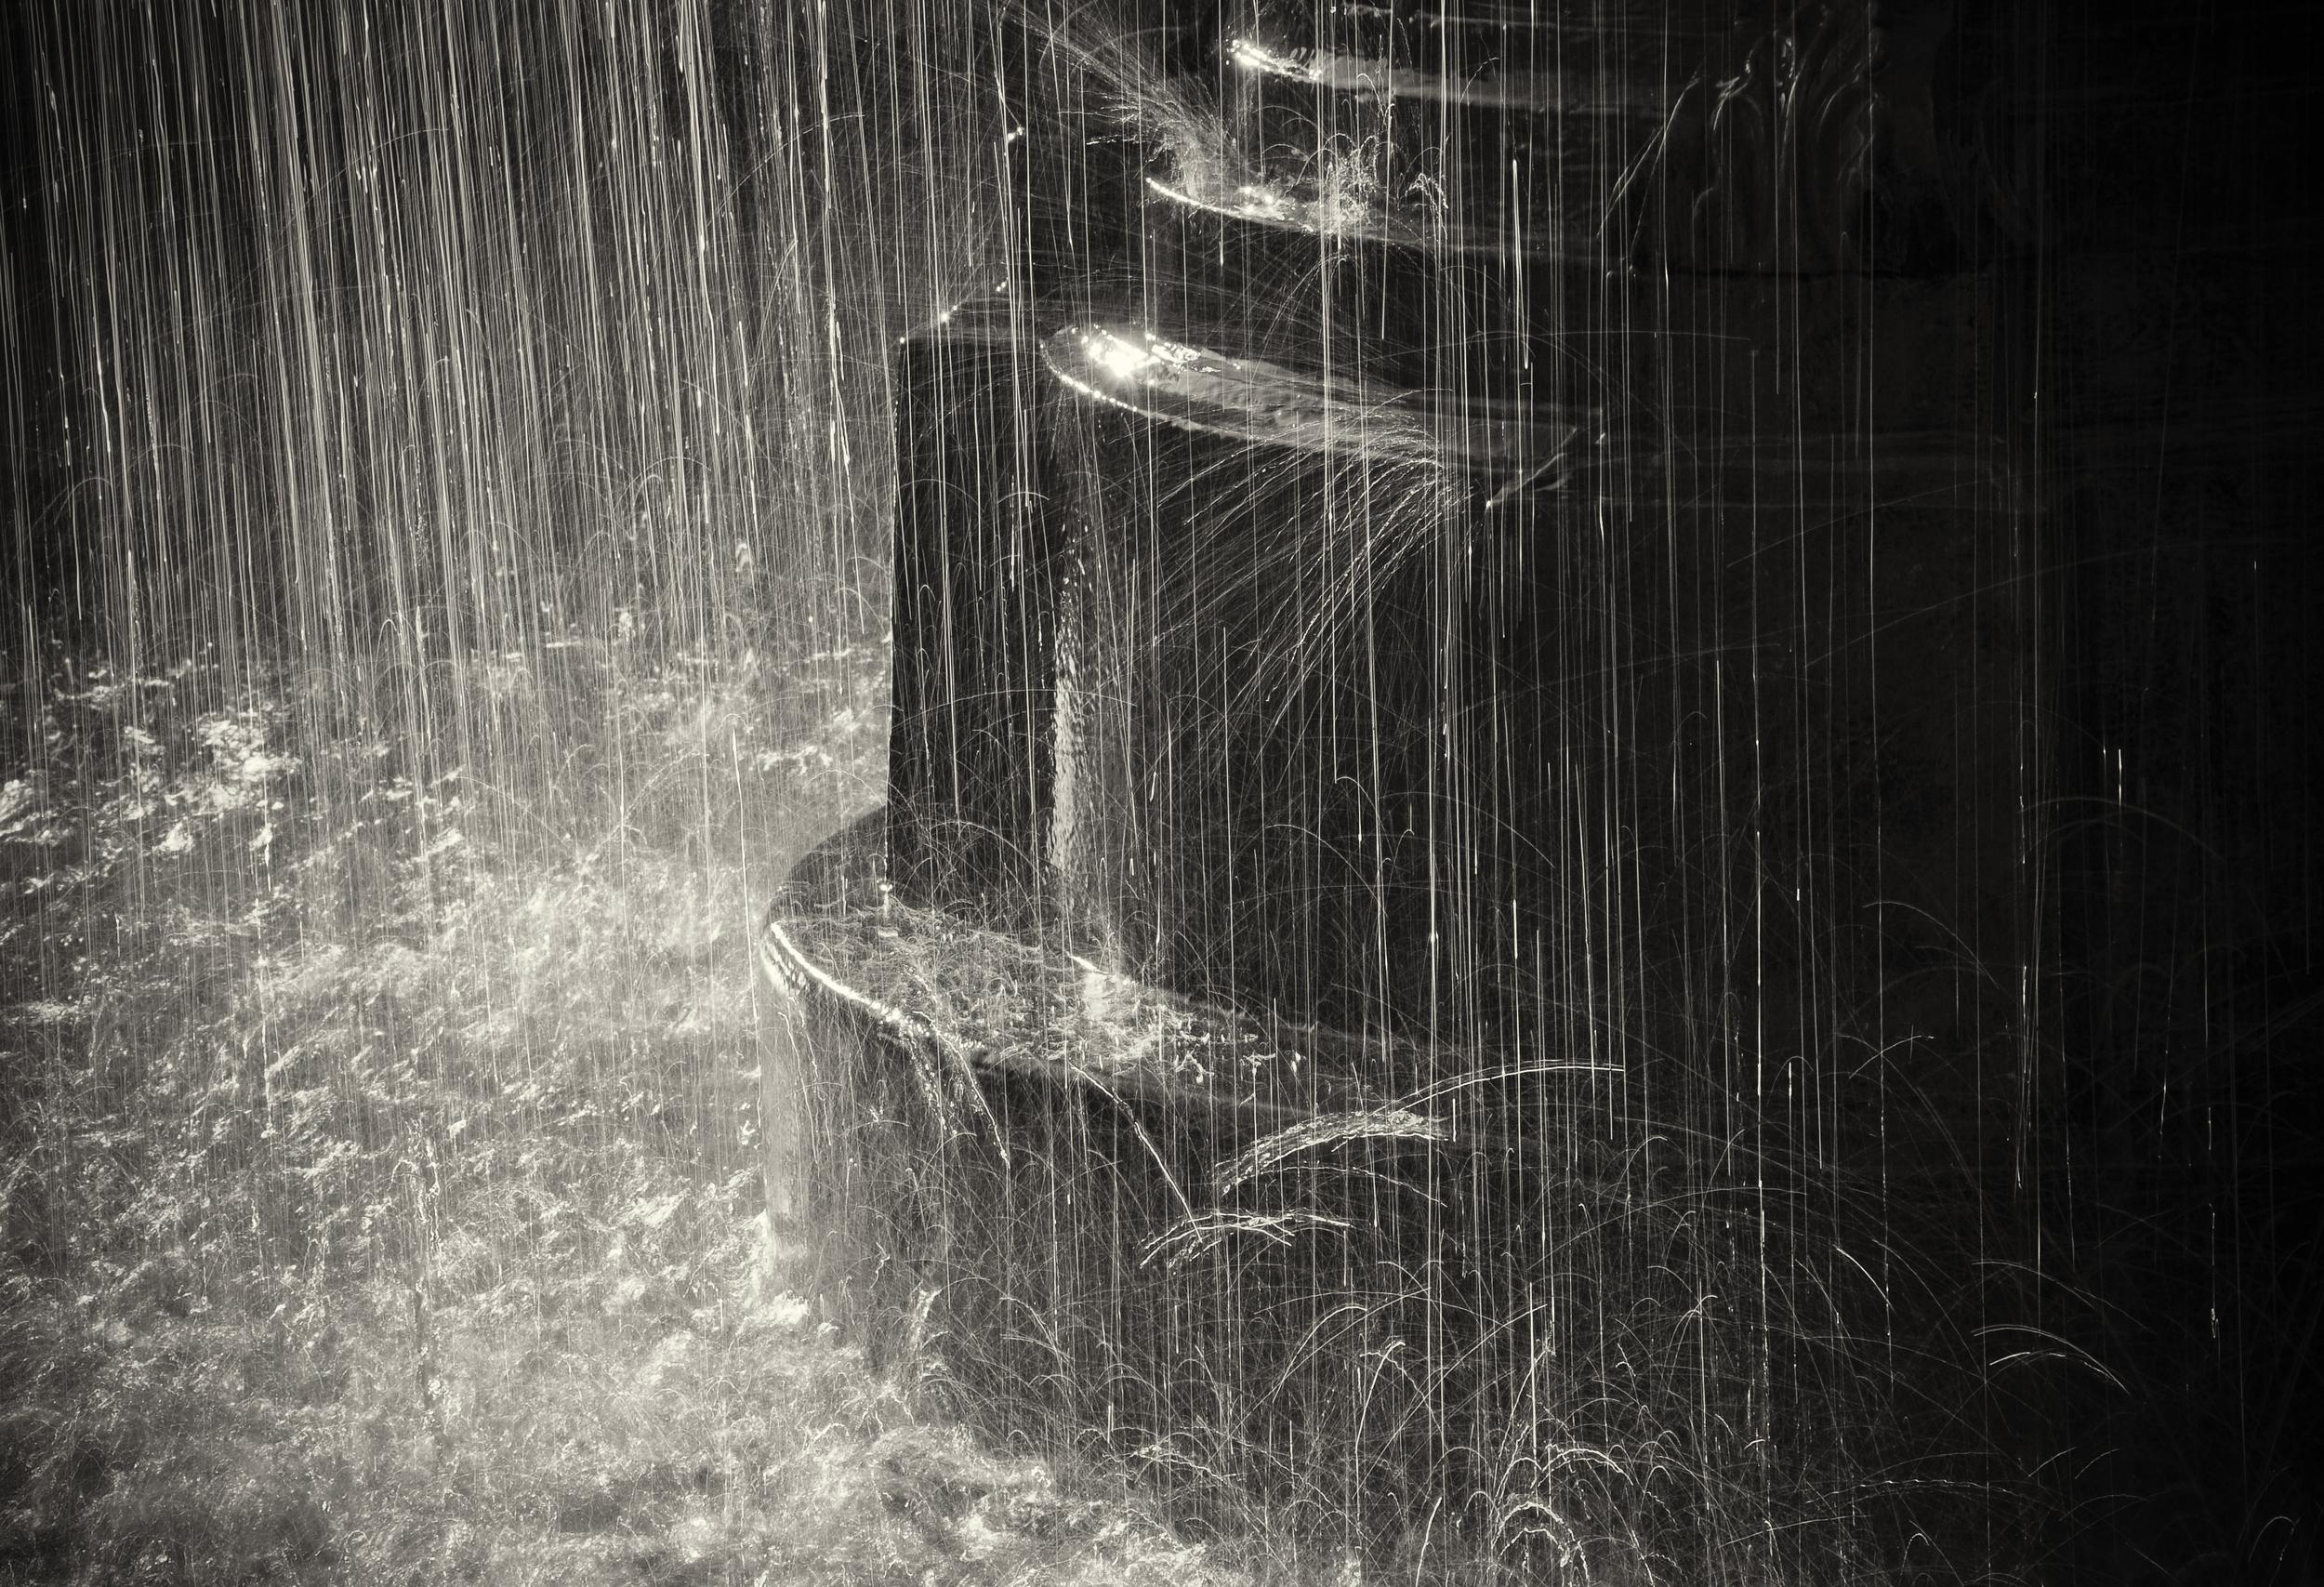 Fountain II   Dryden, New York